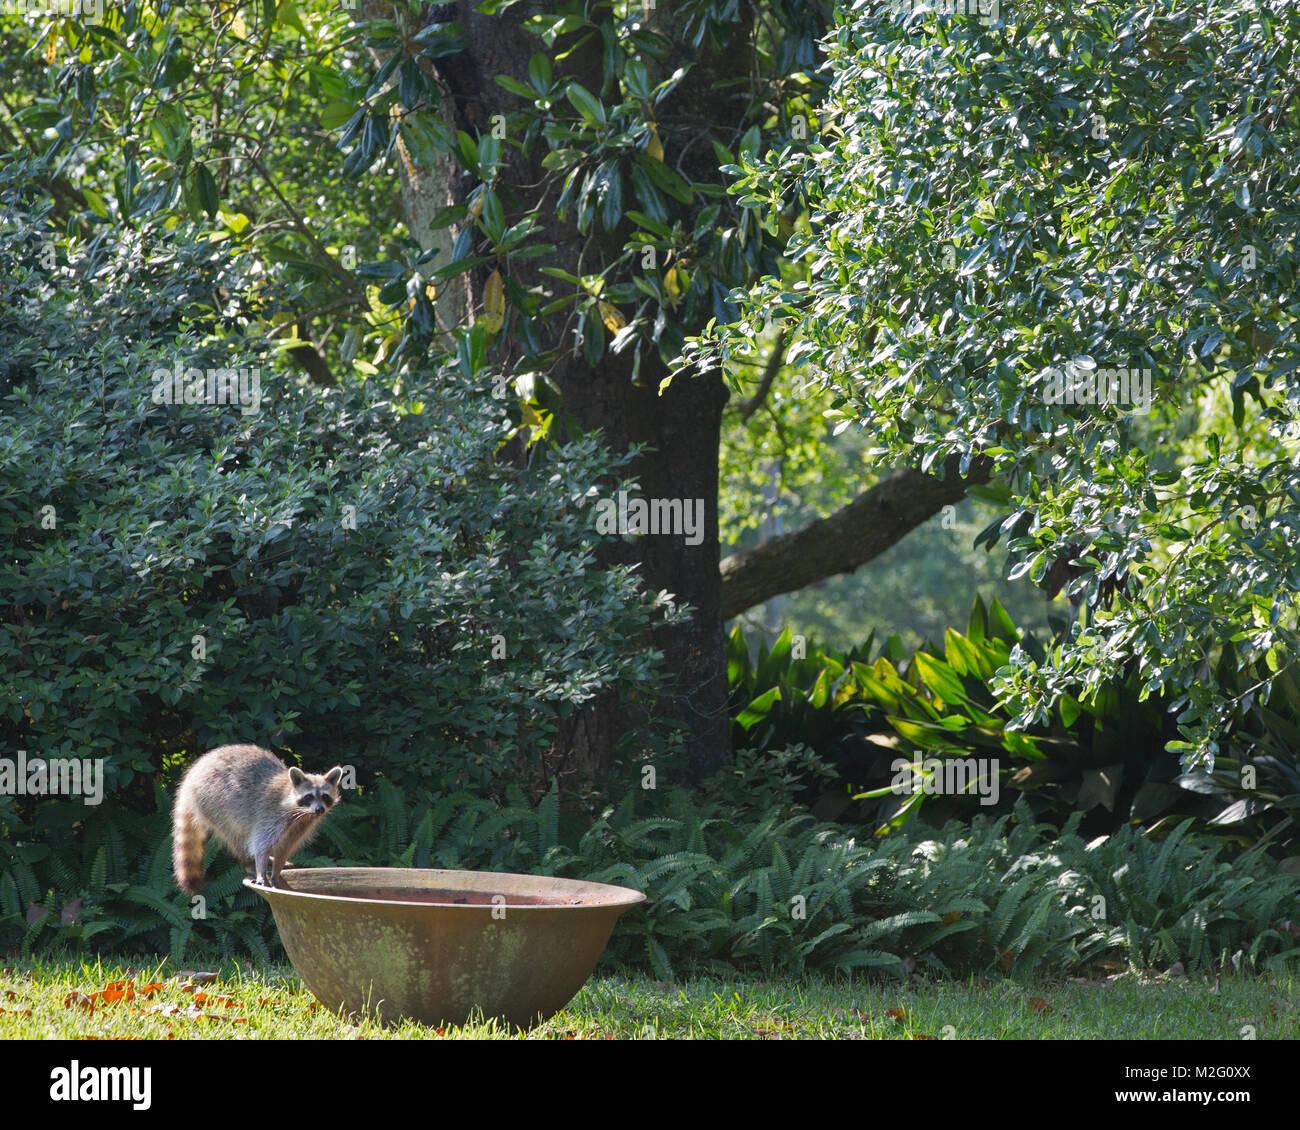 Raccoon (Procyon lotor) in Rip Van Winkle Gardens on Jefferson Island - Stock Image